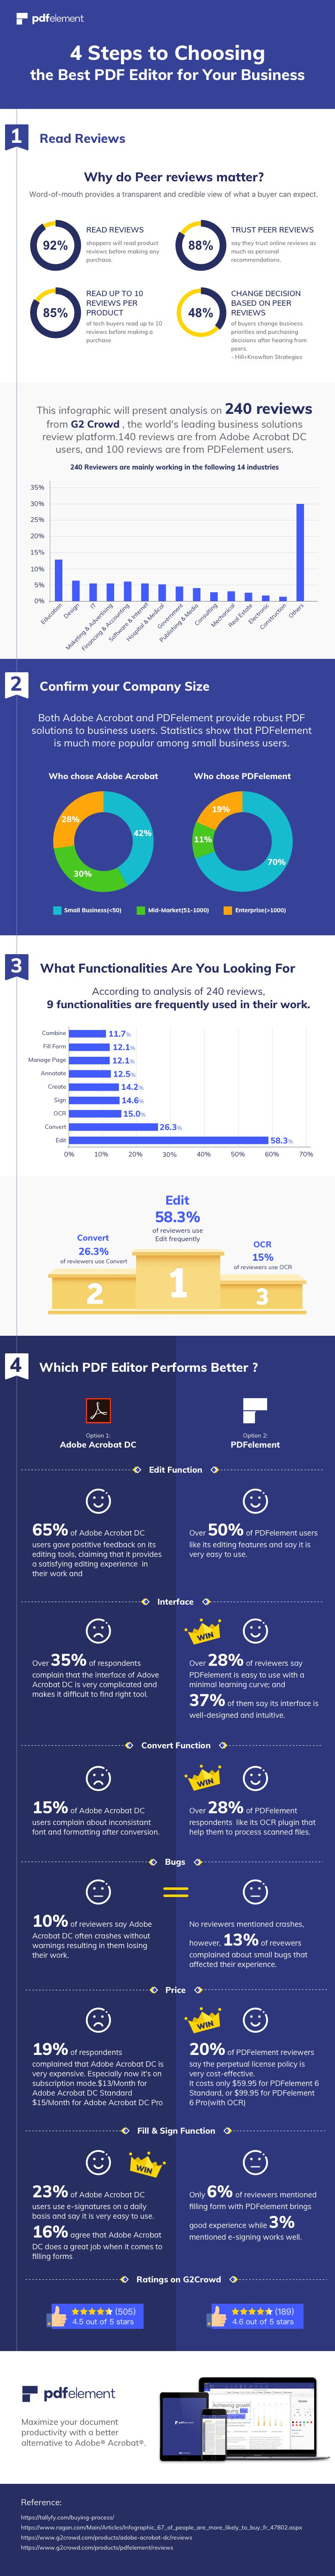 4 Steps to Choose Best PDF Editor